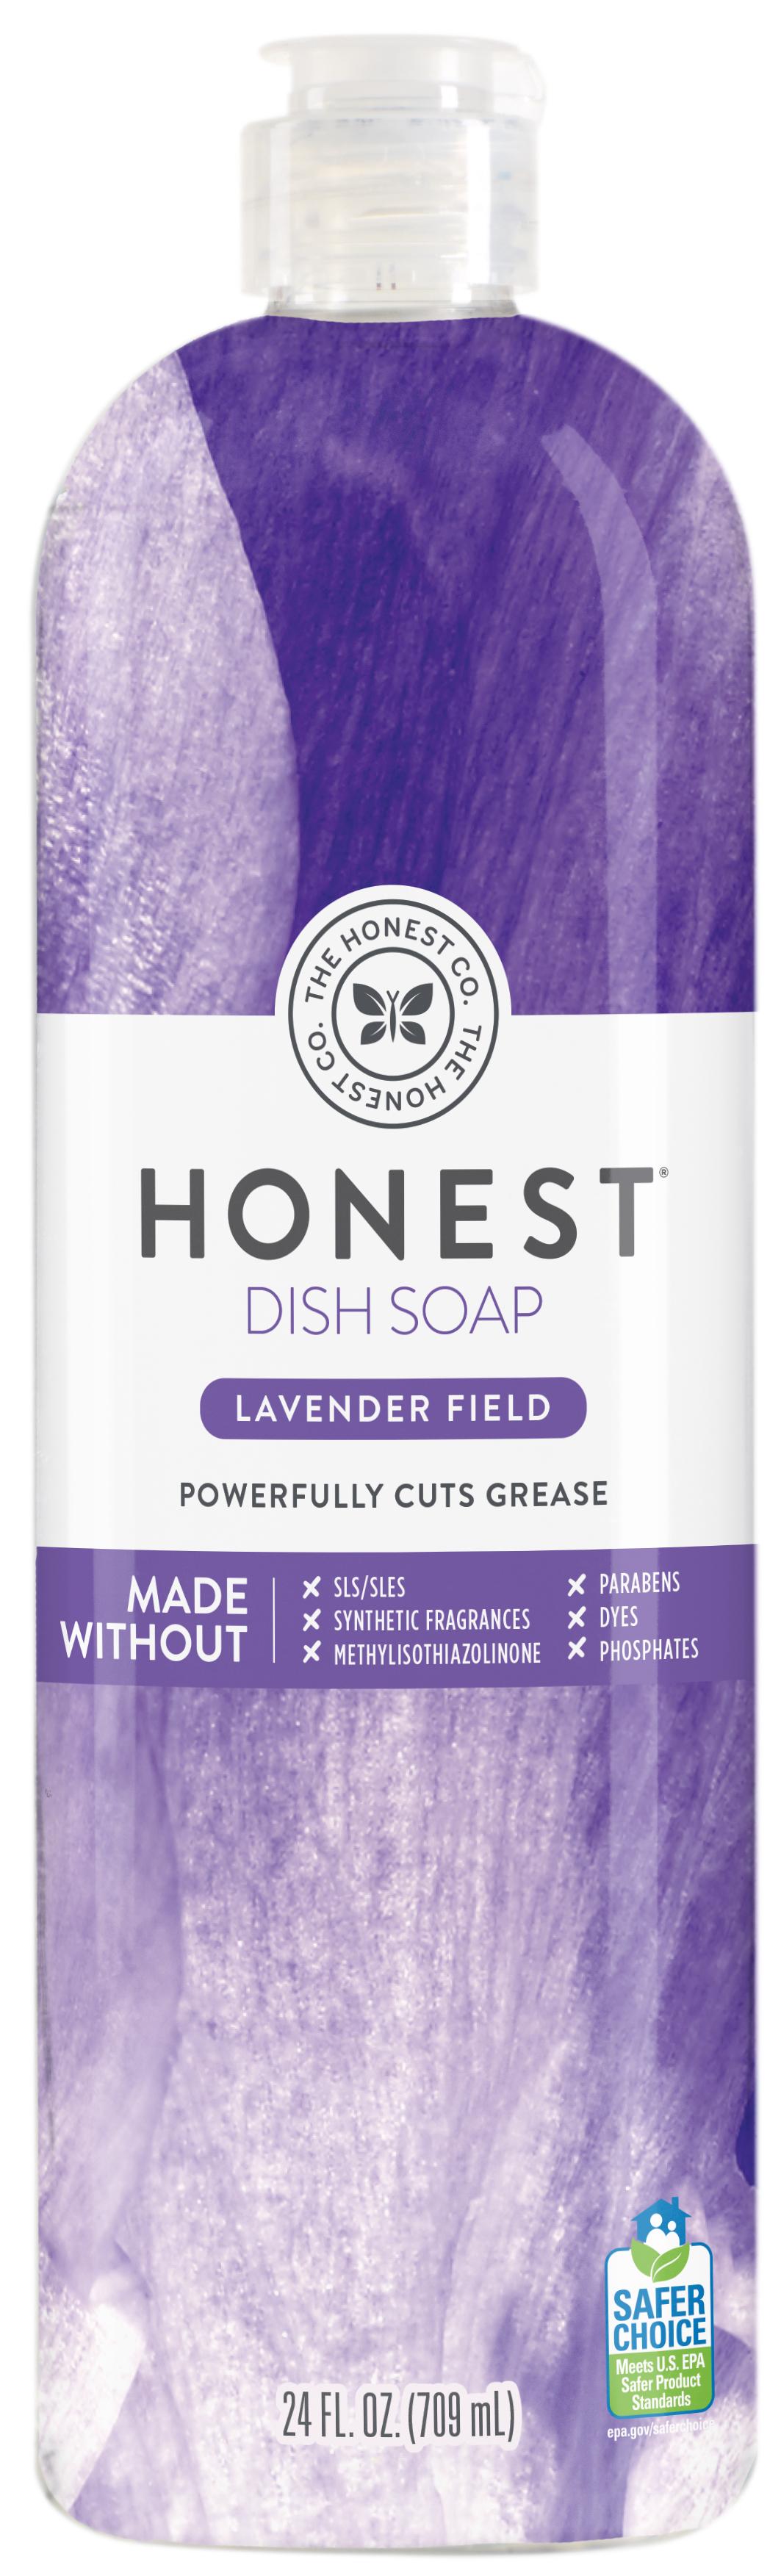 DishSoap_24floz_Lavender.jpg